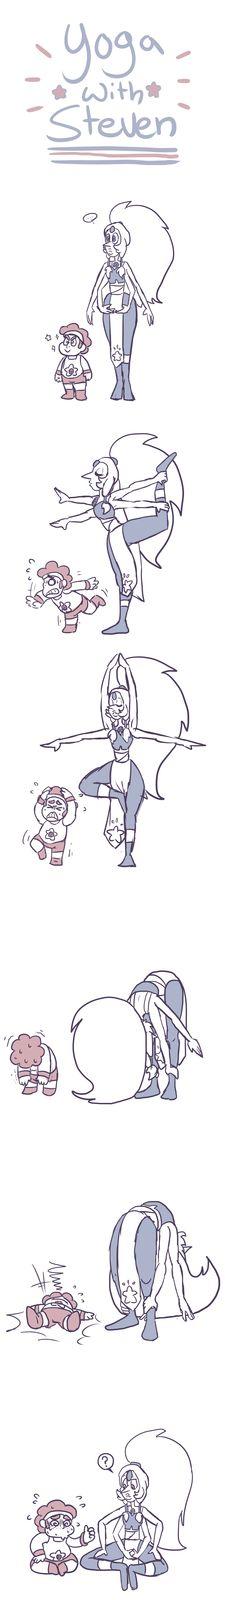 Yoga With Steven by impomaniac